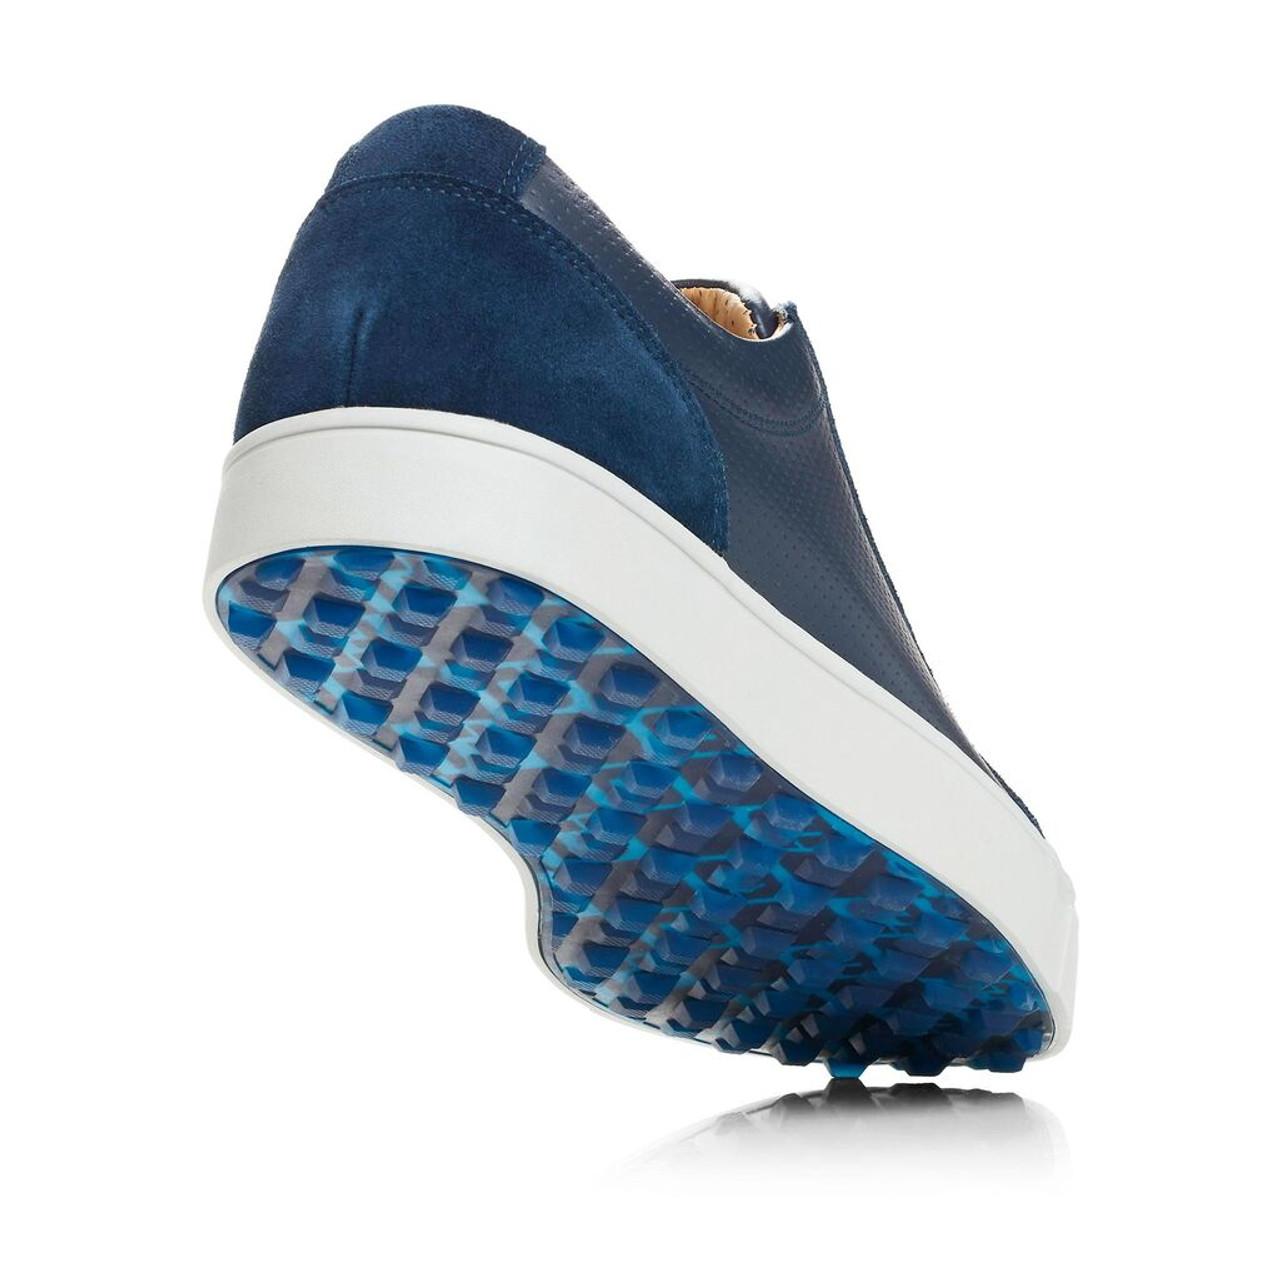 FootJoy Club Casuals Blucher Golf Shoes - Navy (79056)